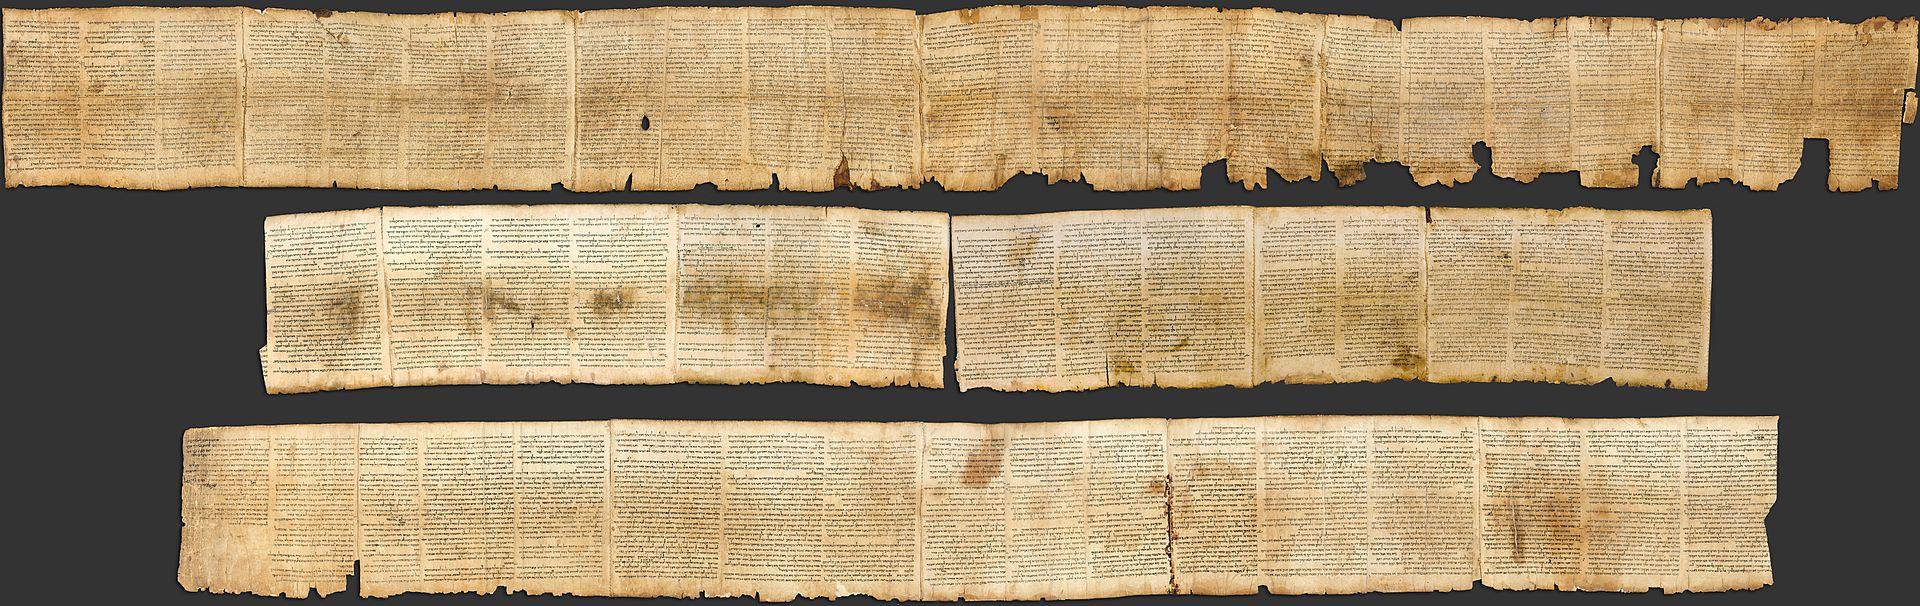 Great Isaiah Scroll.jpg